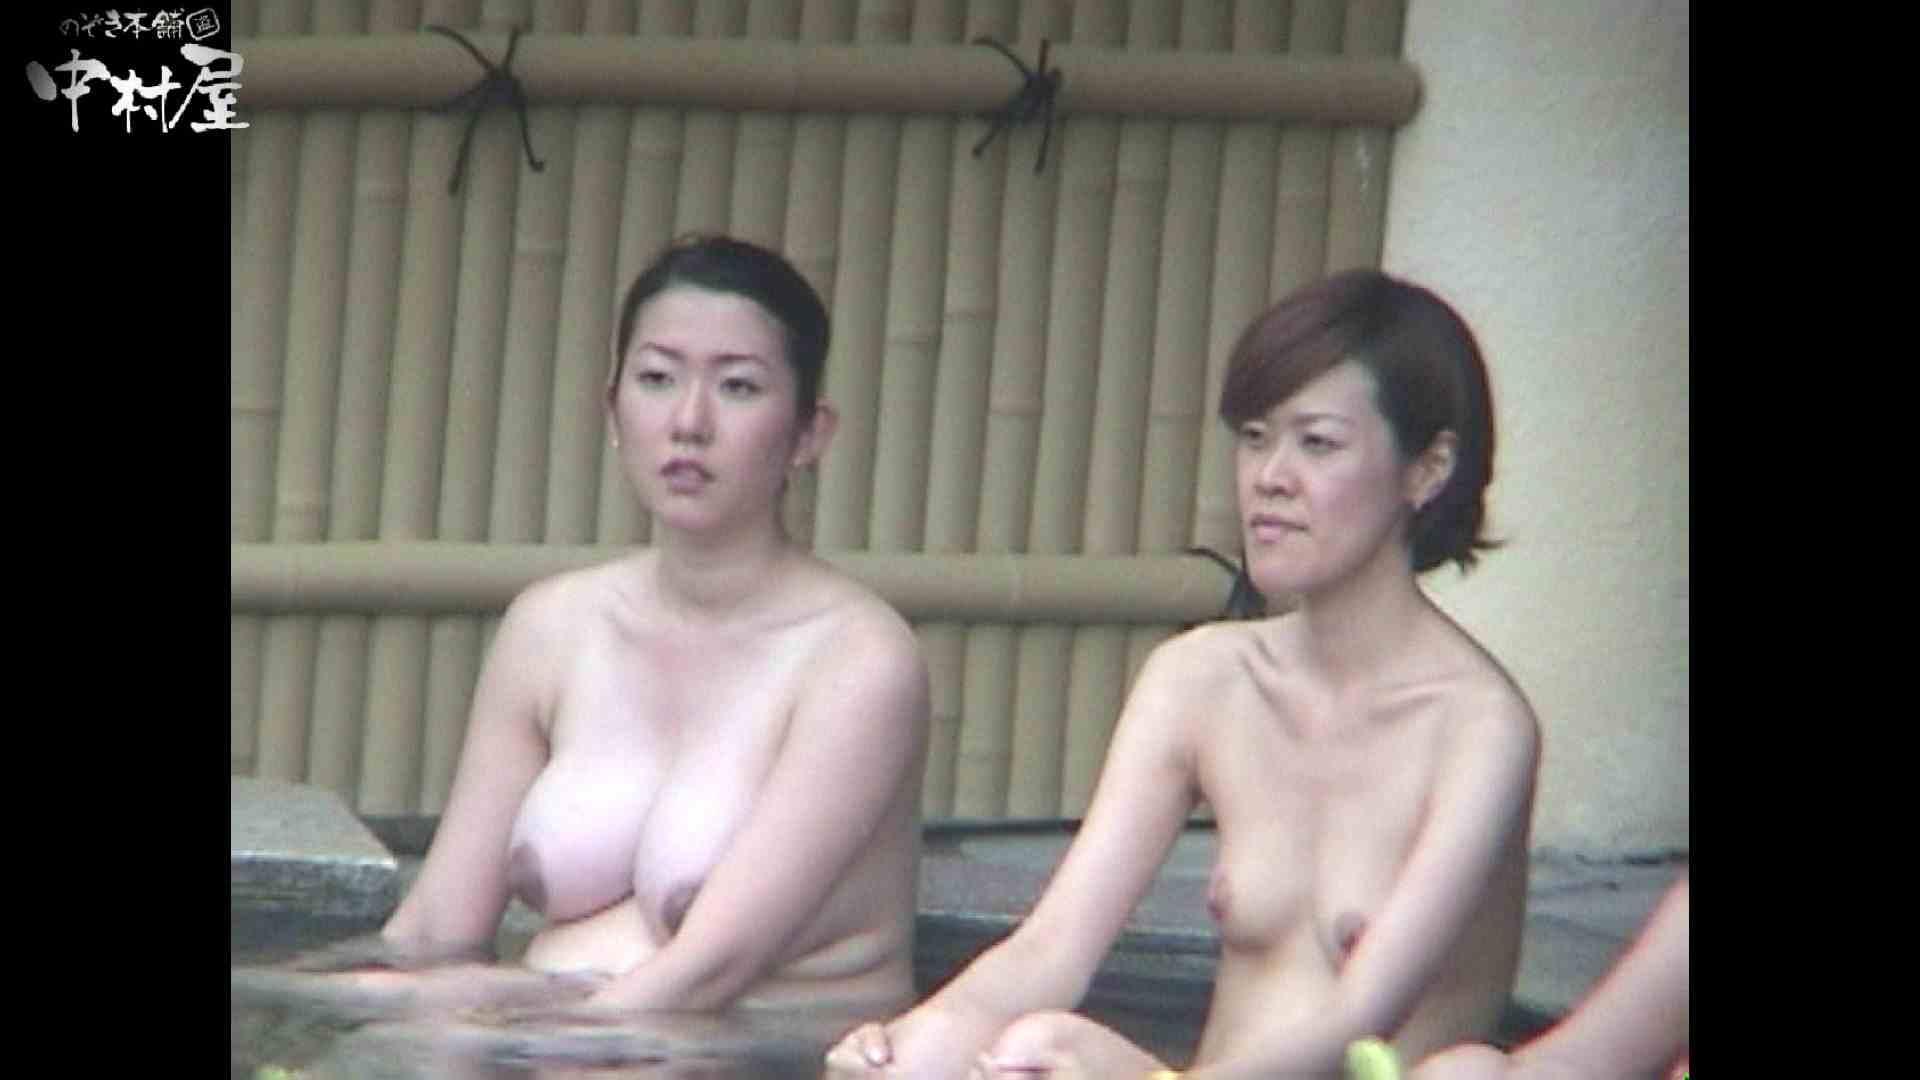 Aquaな露天風呂Vol.961 OLセックス  86画像 21